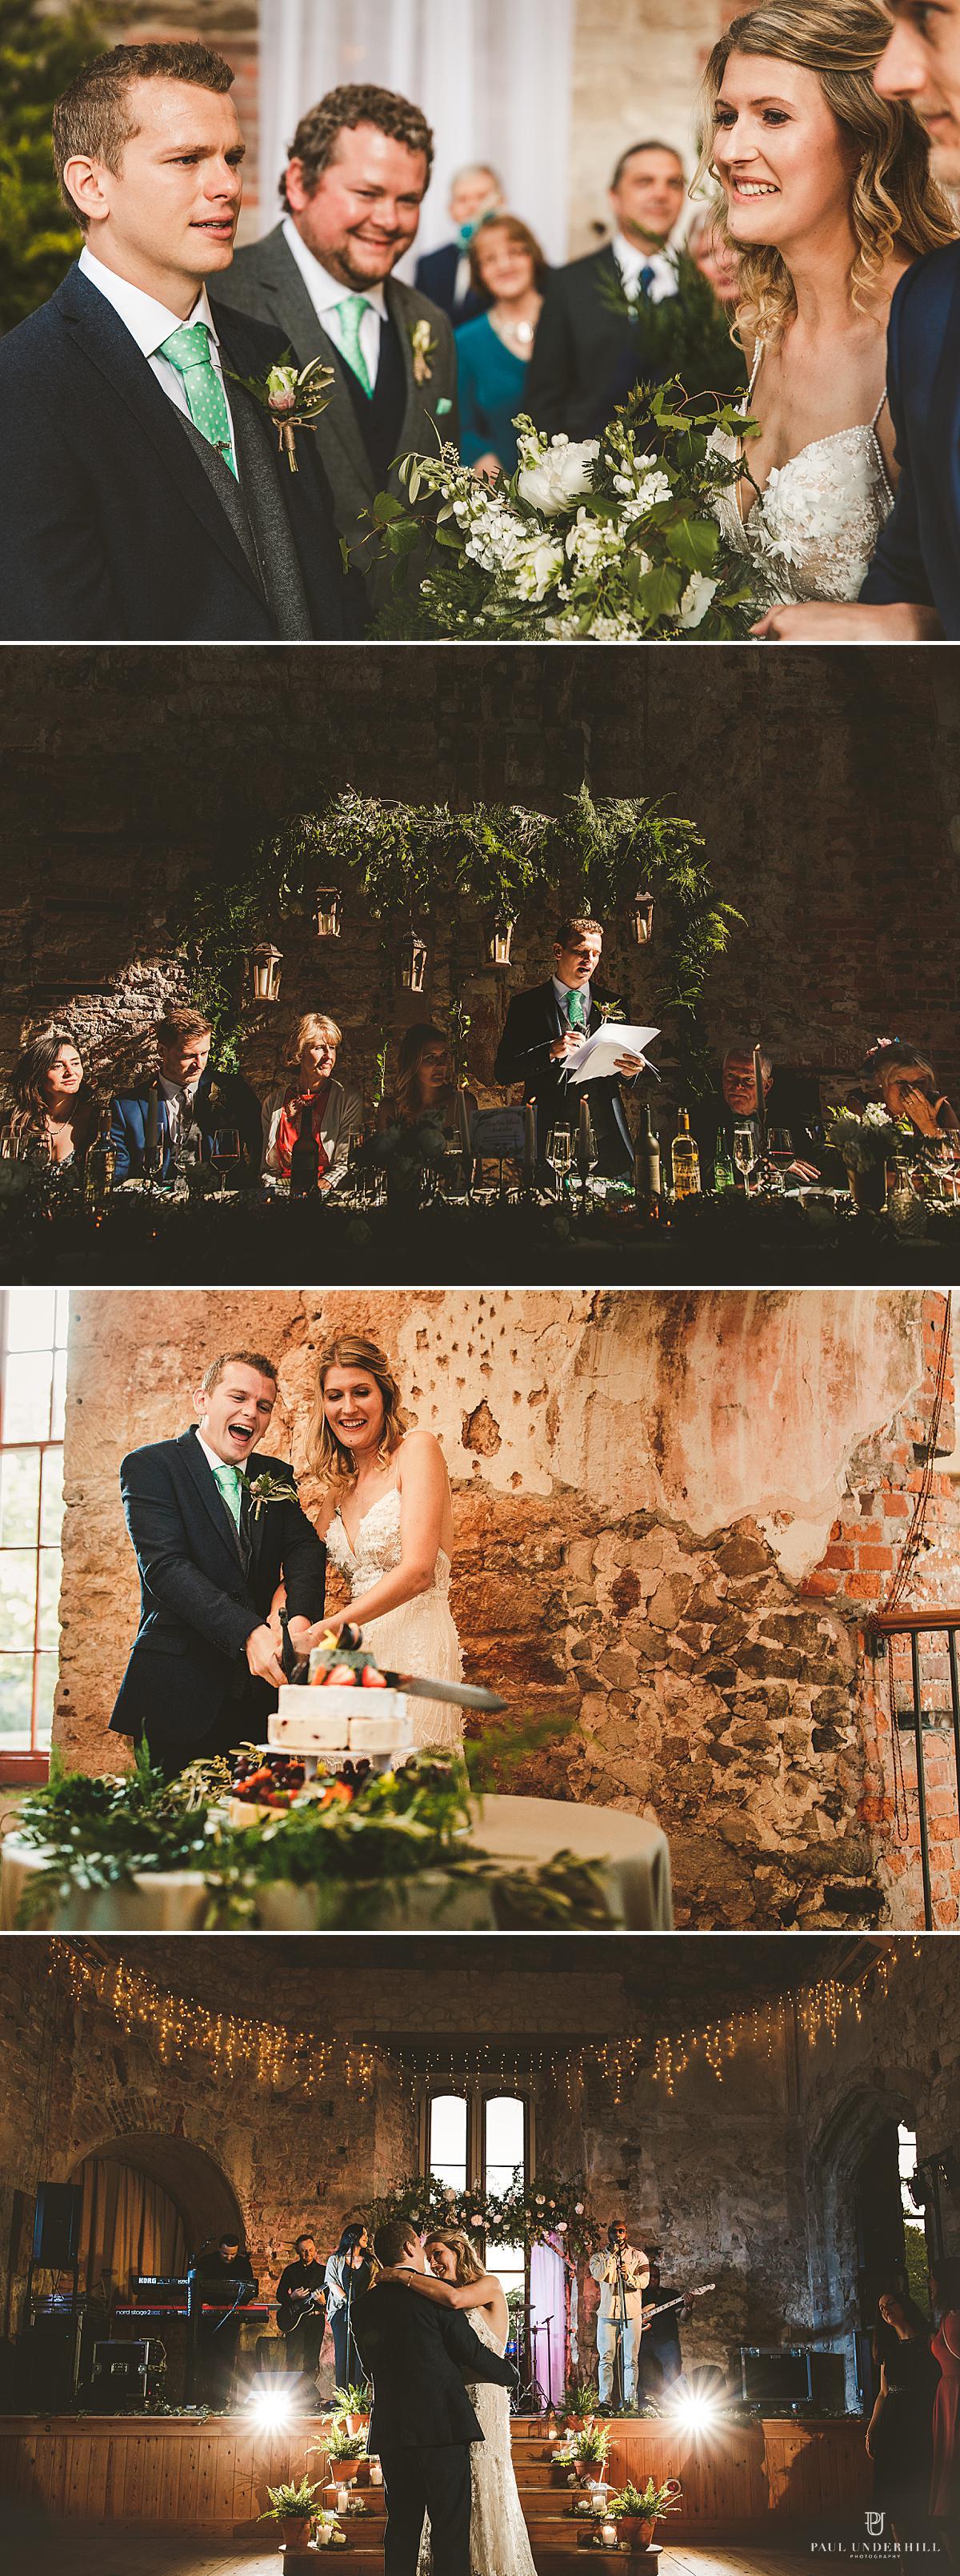 Lulworth Castle wedding photography Dorset